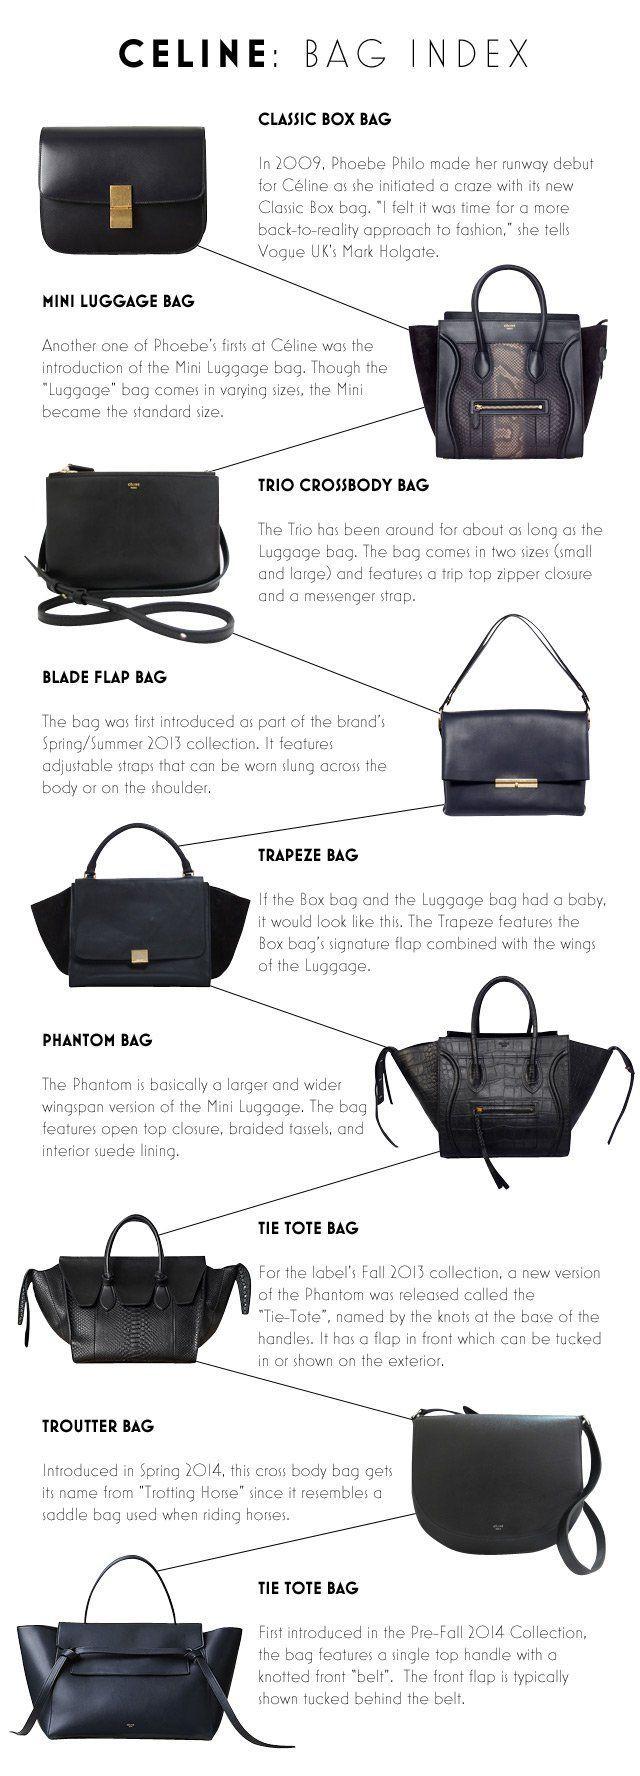 DESIGNER BAG INDEX: CÉLINE | Fashion Style Report